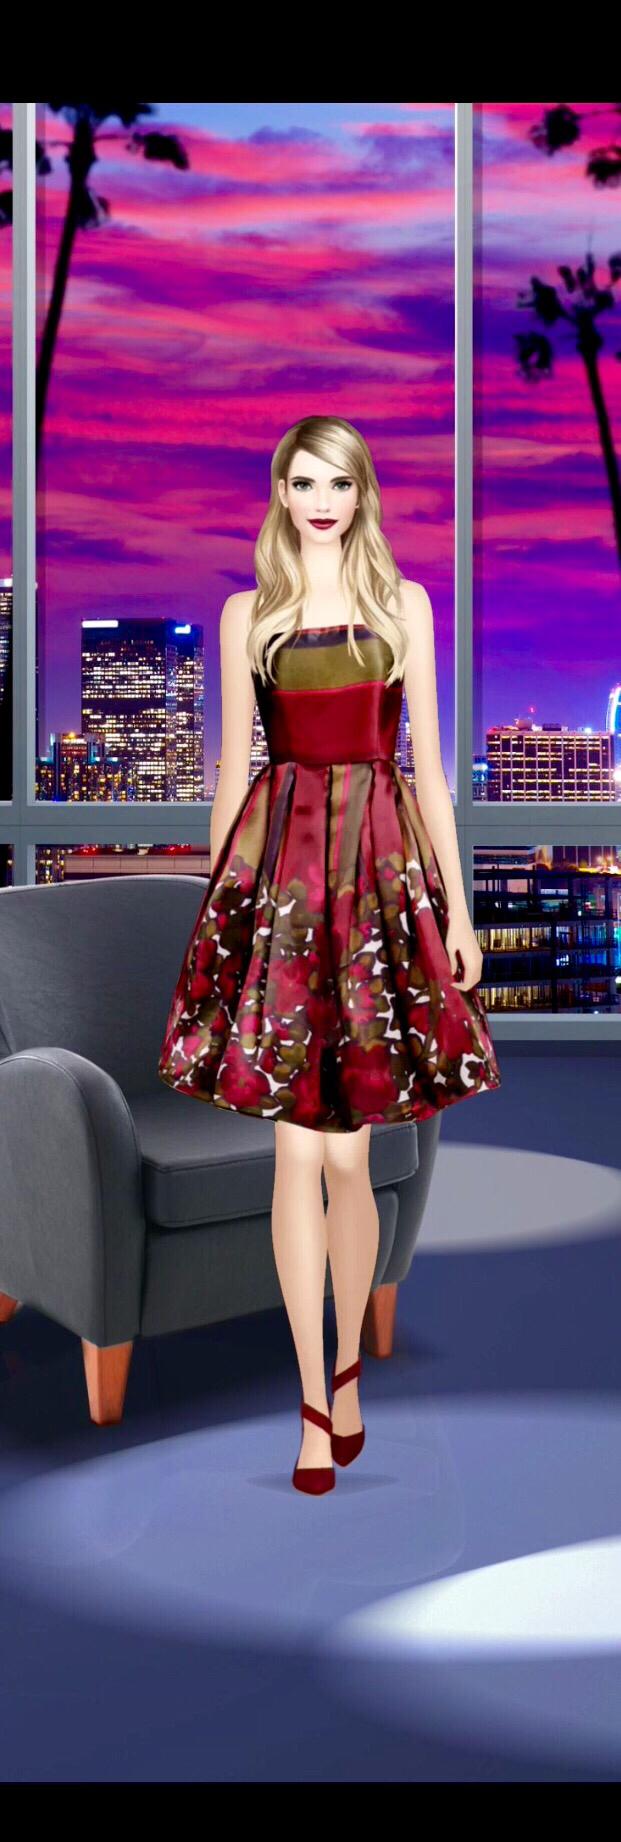 Emma Roberts Day 8: Late Night Talk Show